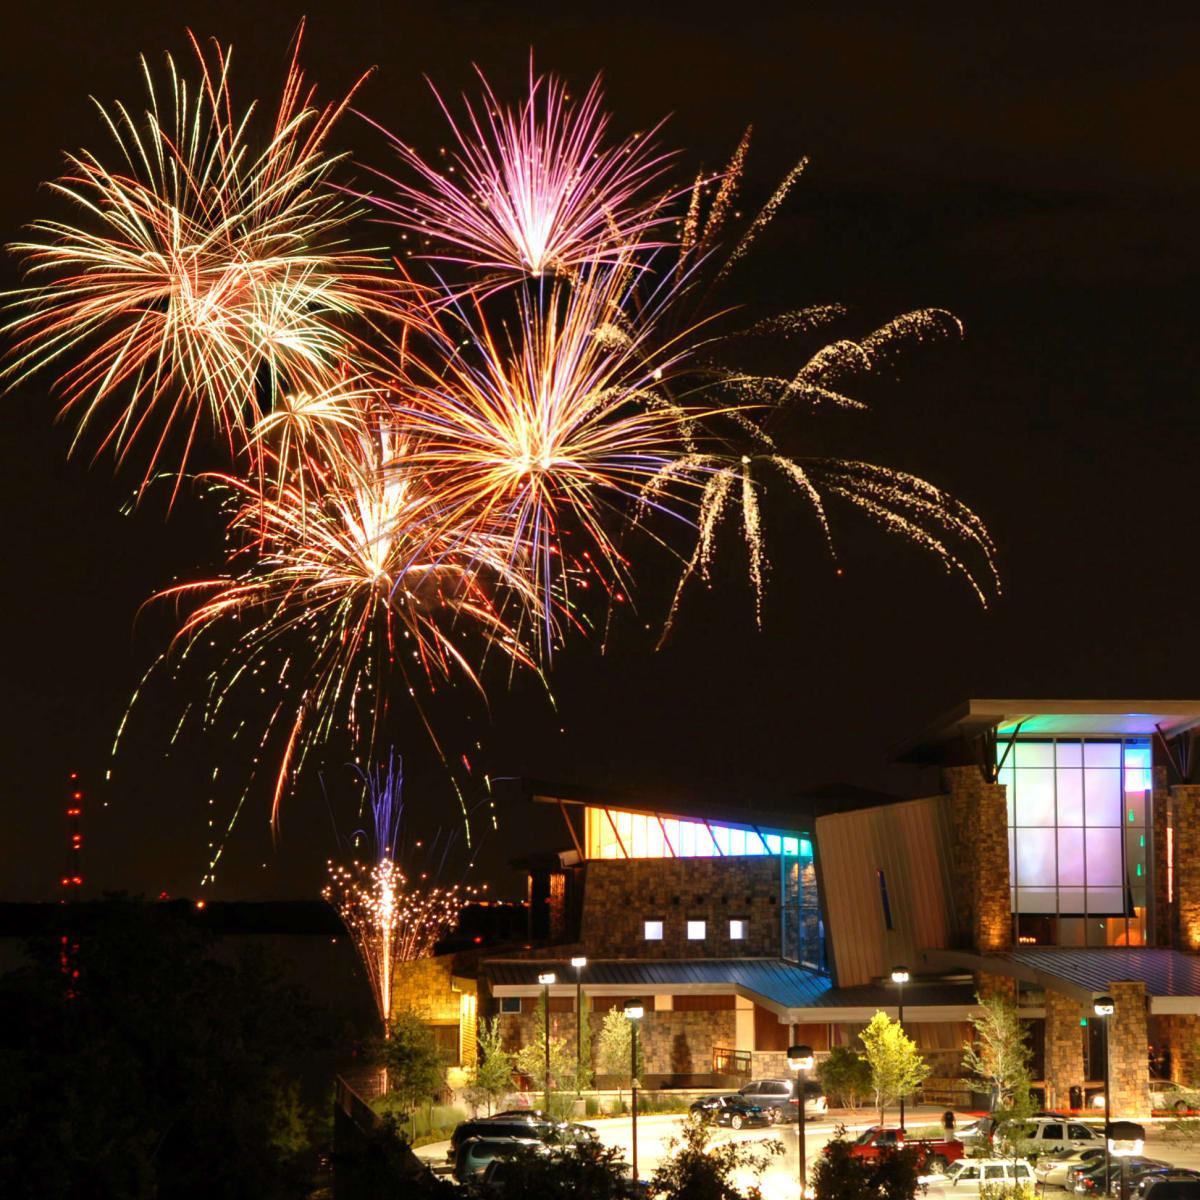 Fireworks at Gaylord Texan Resort